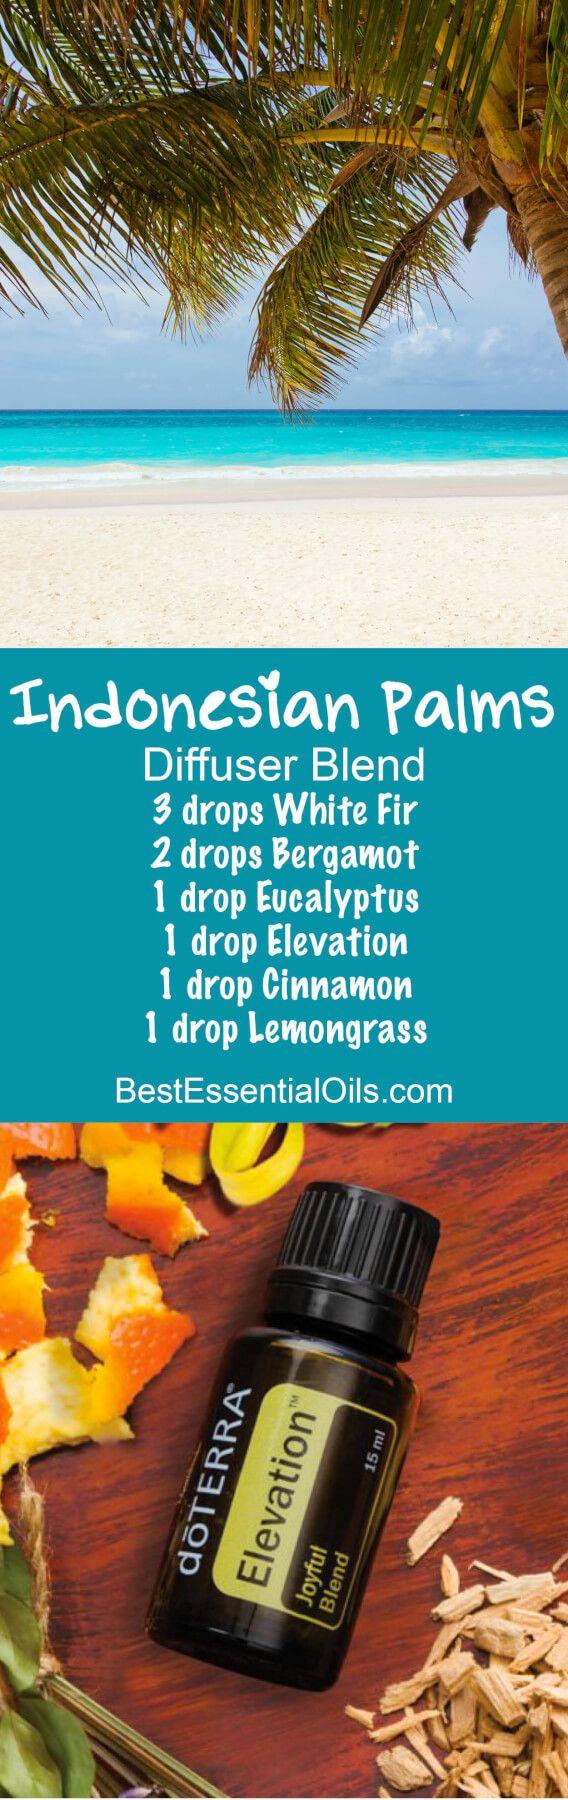 Indonesian Palms doTERRA Diffuser Blend